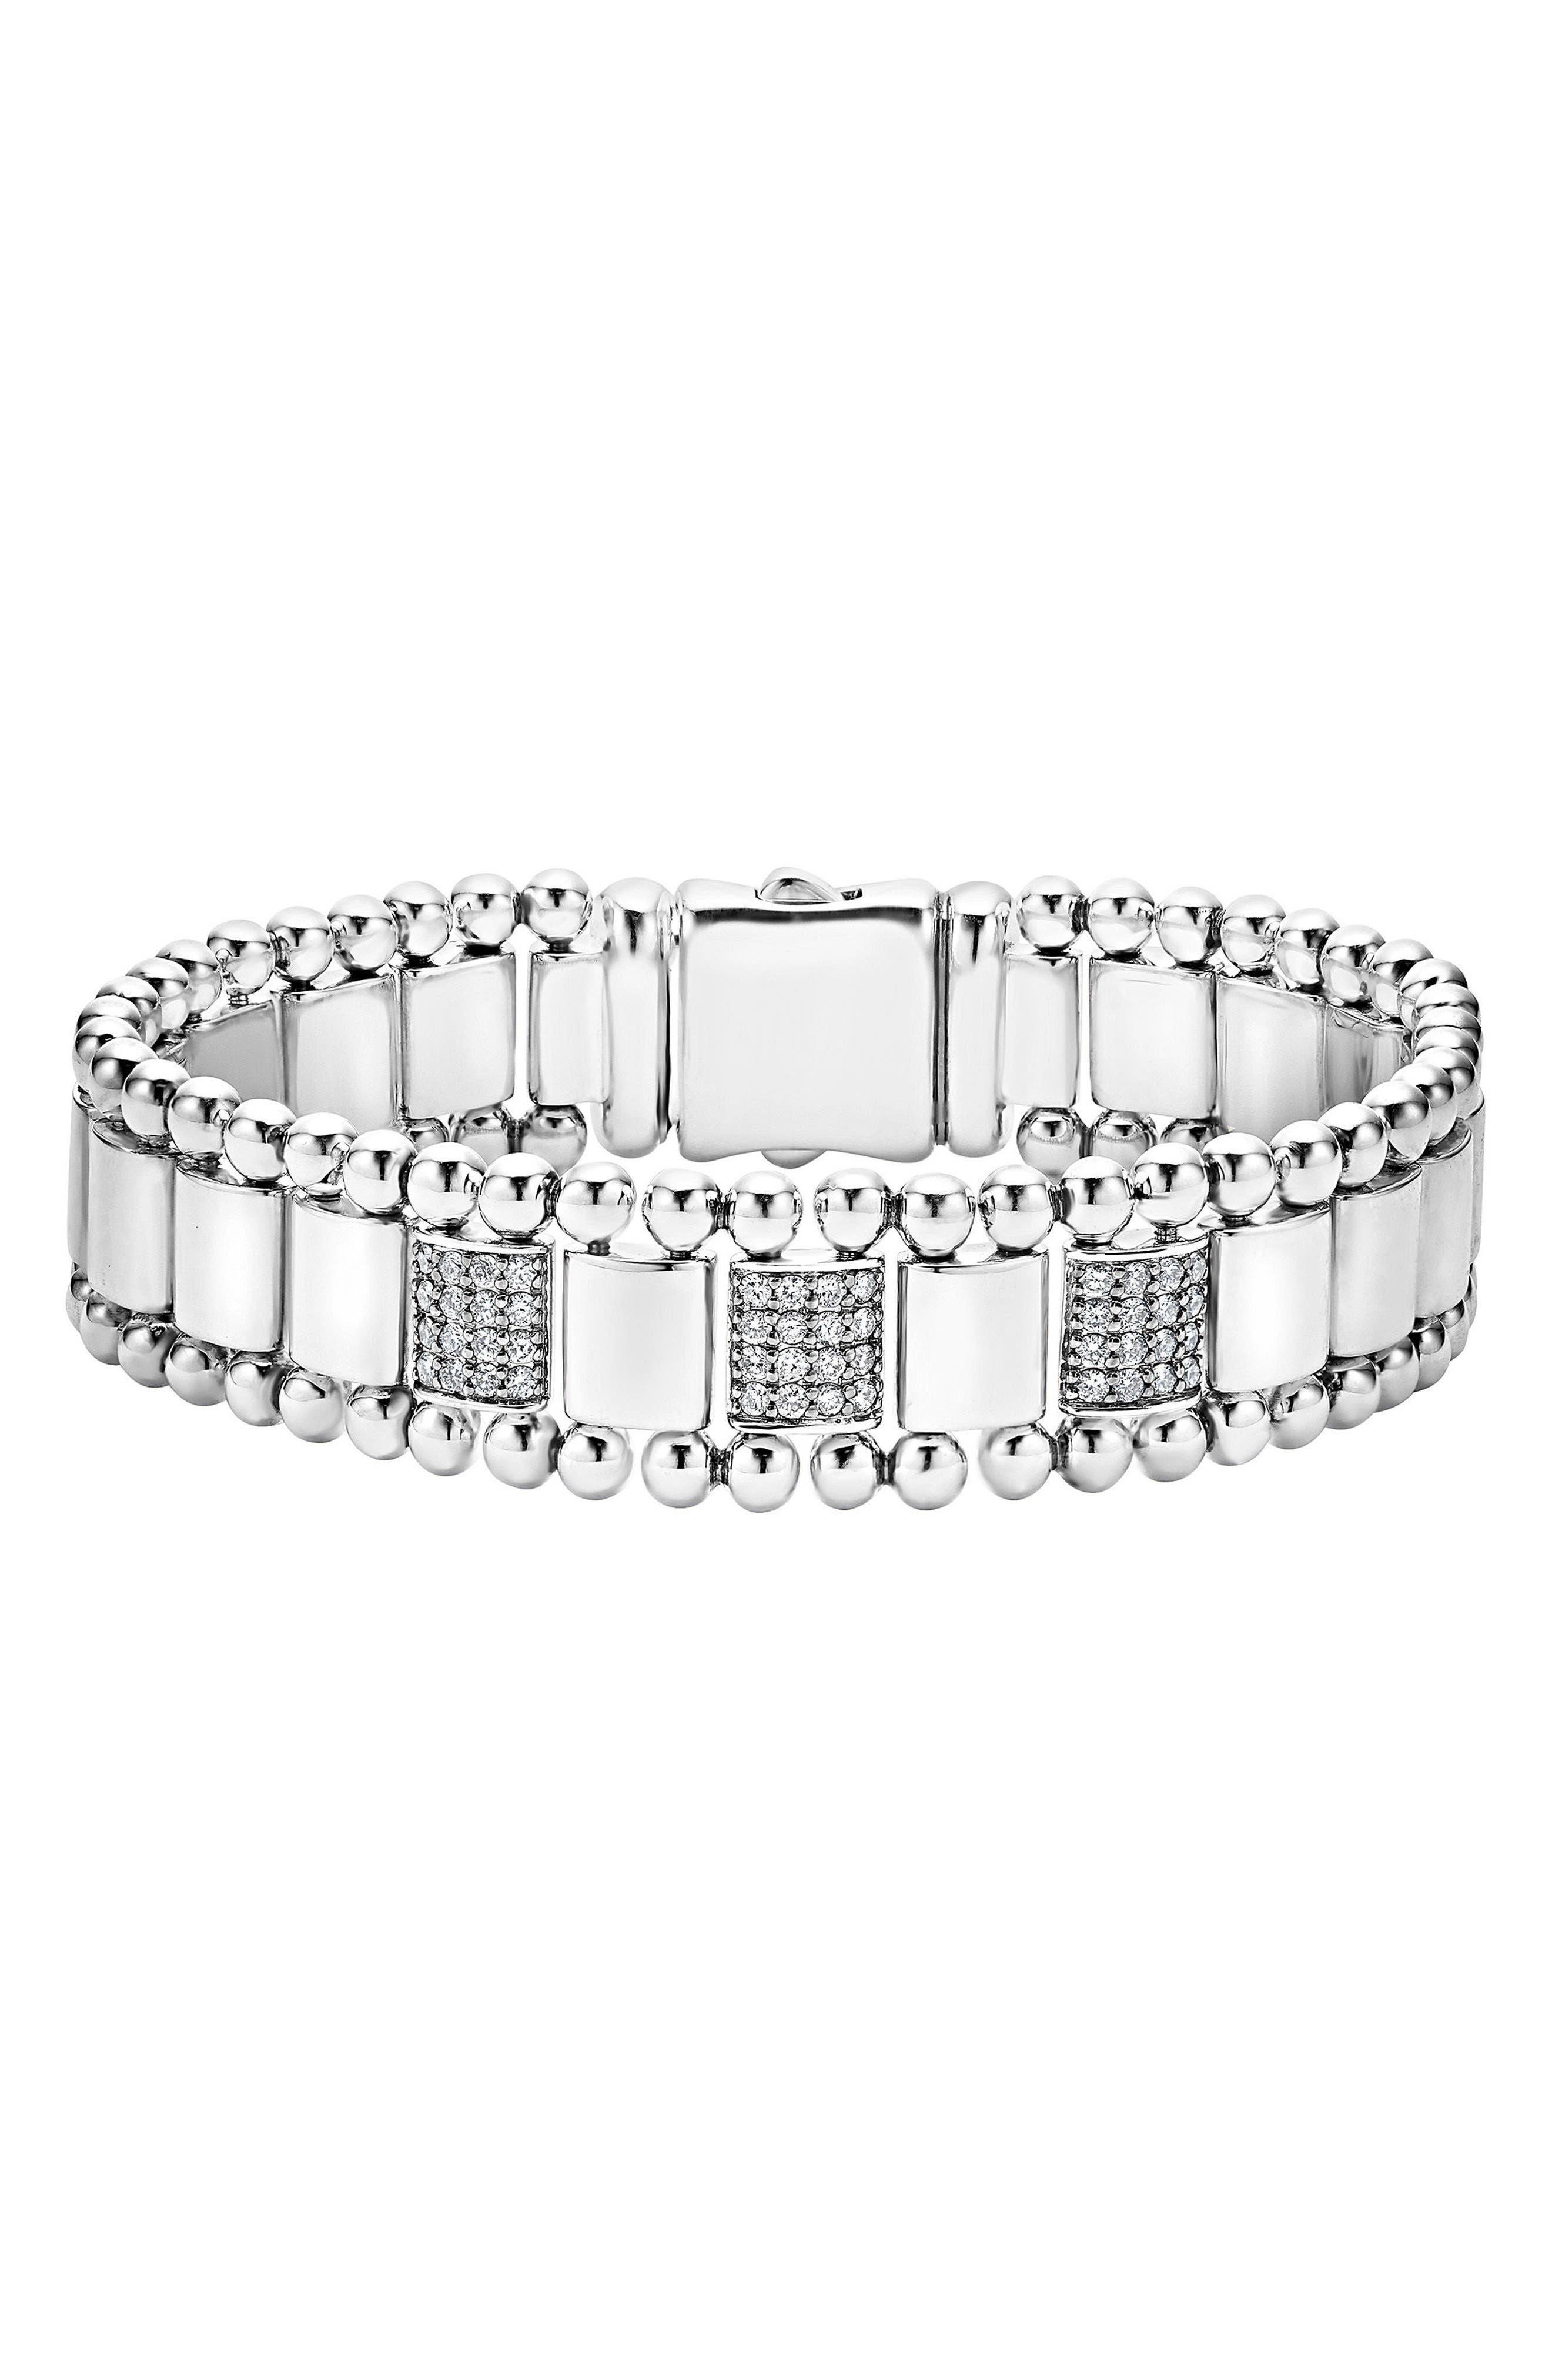 Caviar Spark Diamond Bracelet,                             Main thumbnail 1, color,                             SILVER